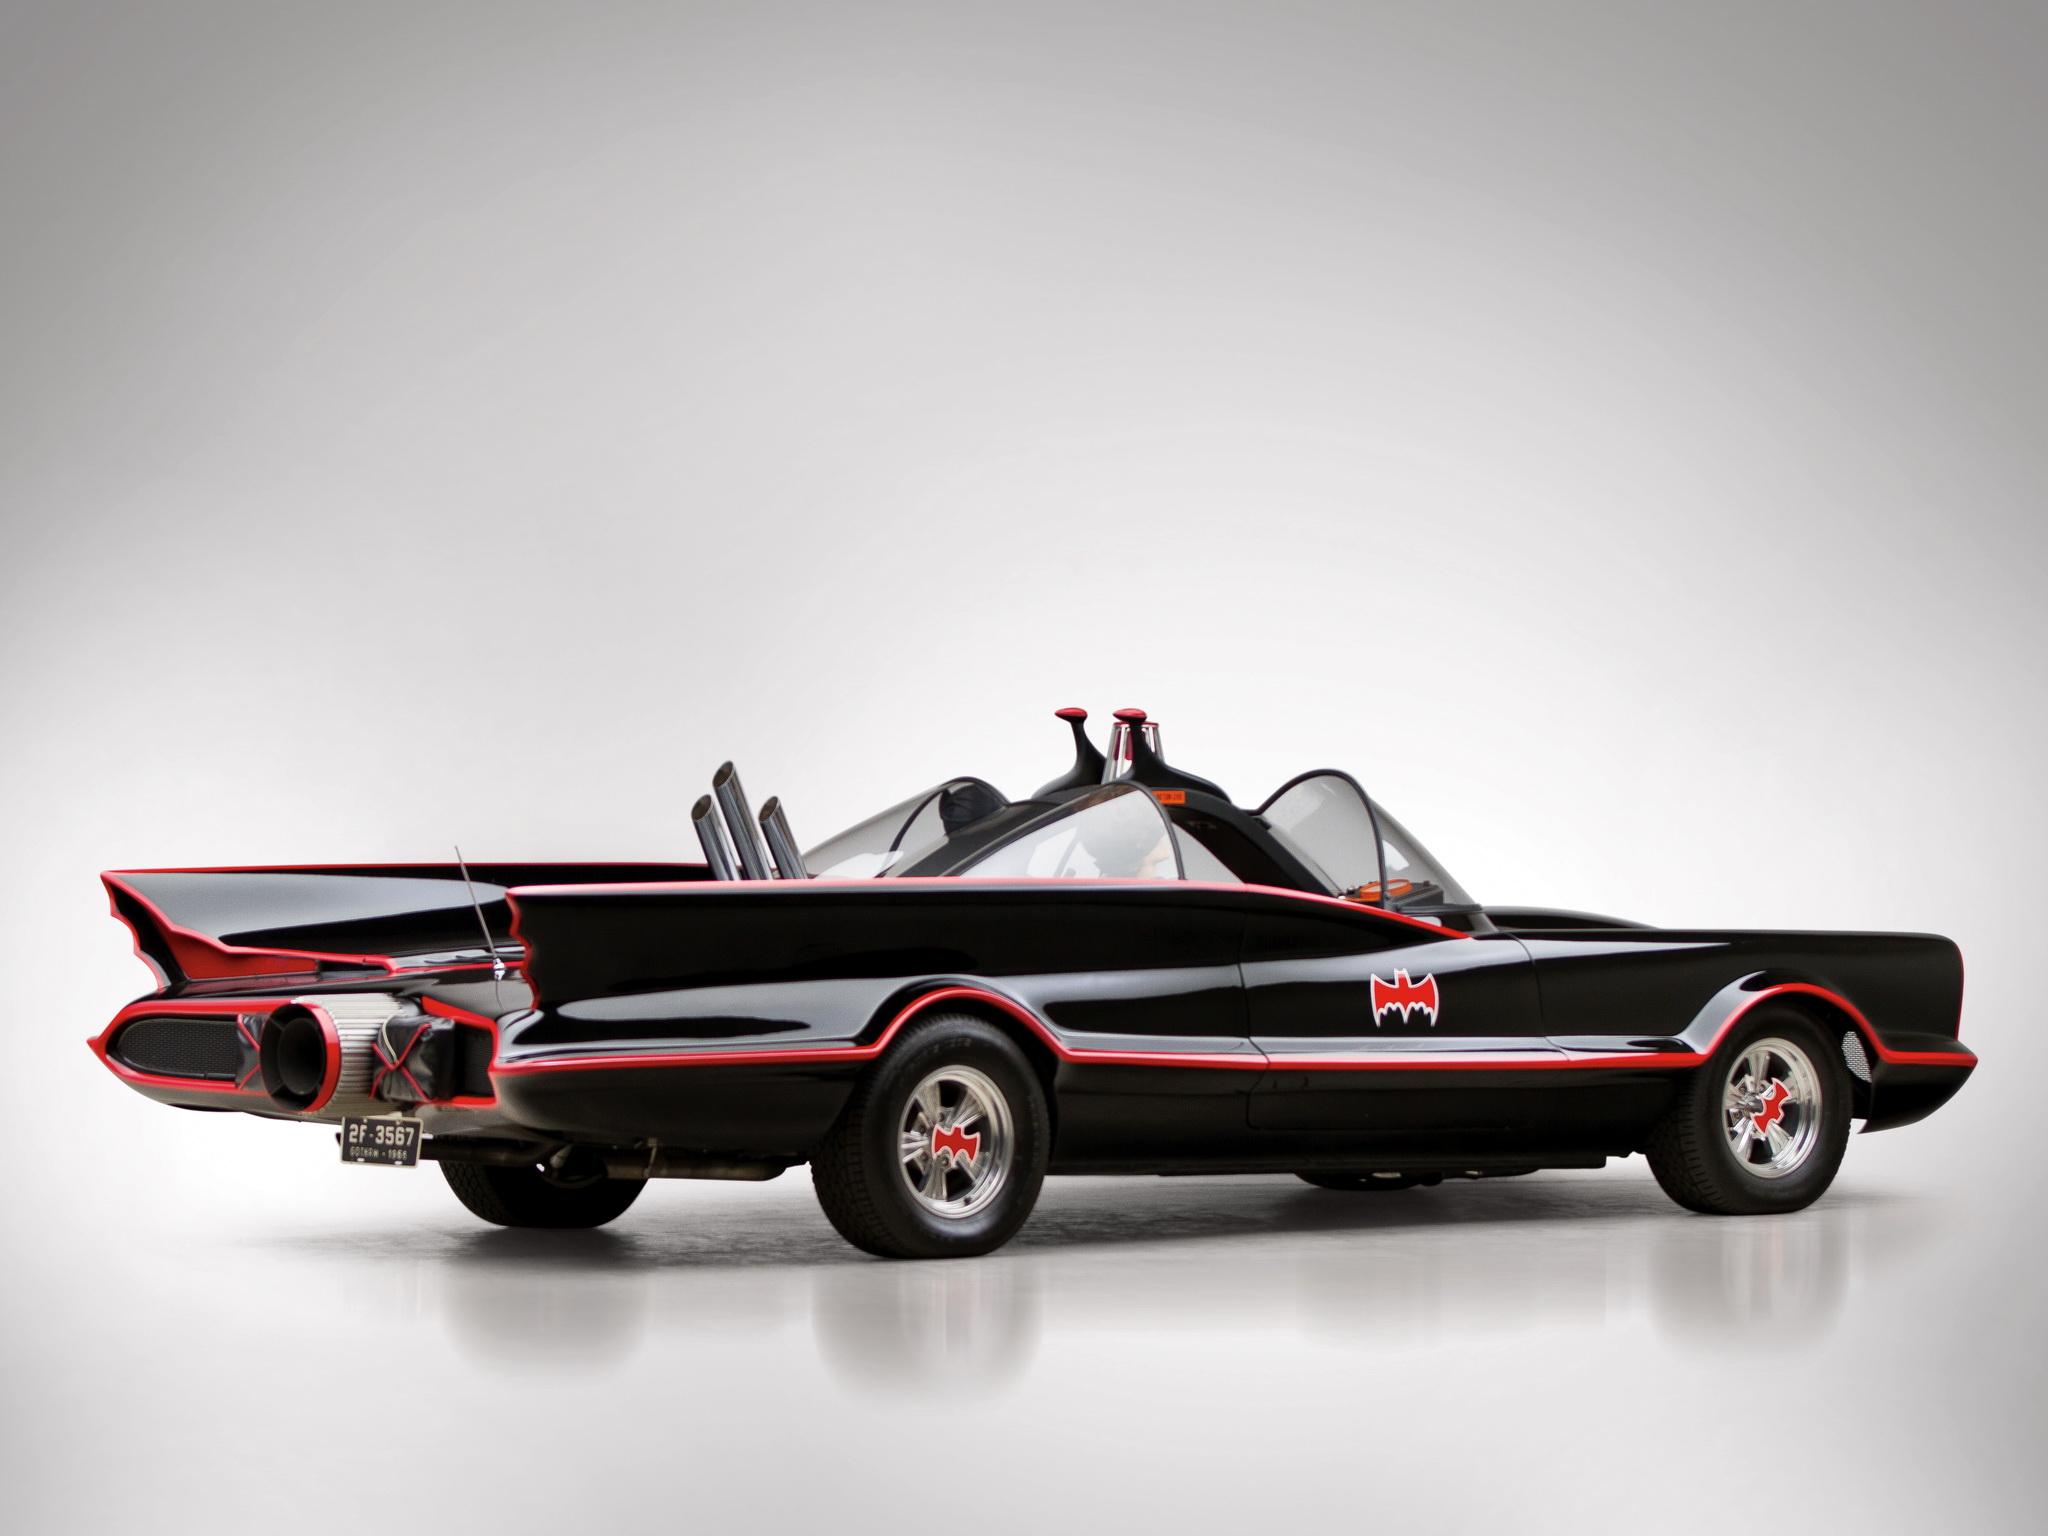 Free Download Car Wallpapers For Mobile 1966 Lincoln Futura Batmobile By Barris Kustom Custum